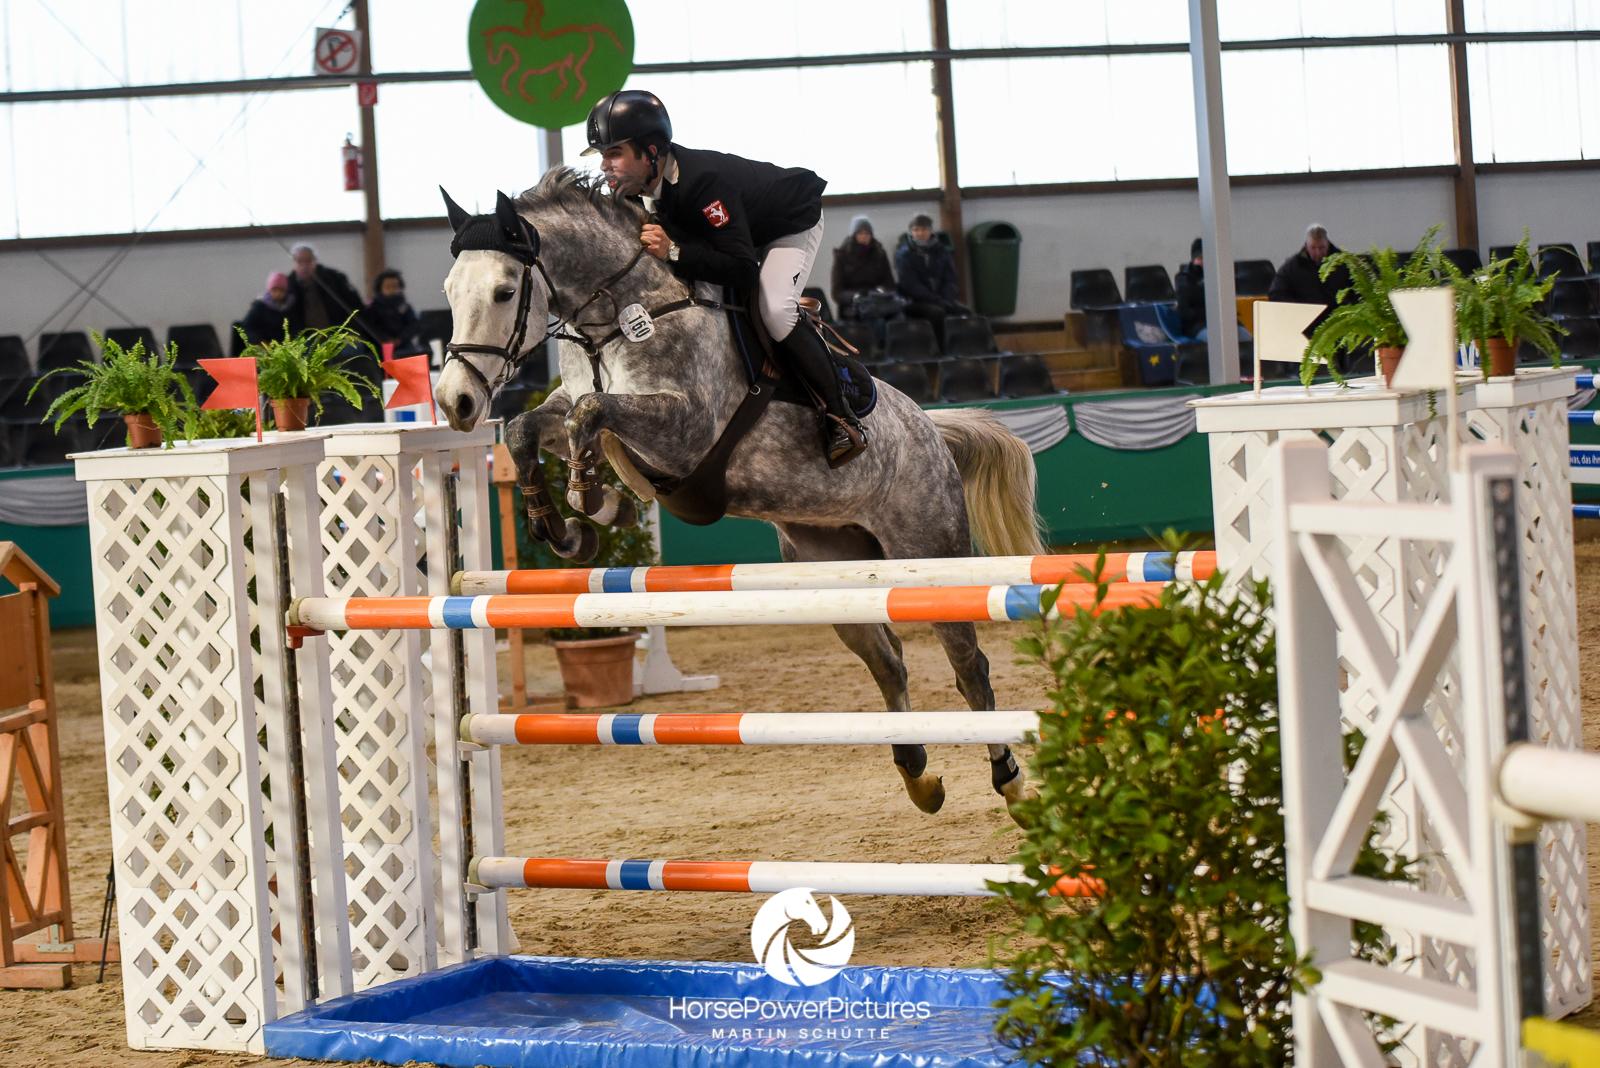 Marvin Carl Haarmann - Team HorsePowerPictures